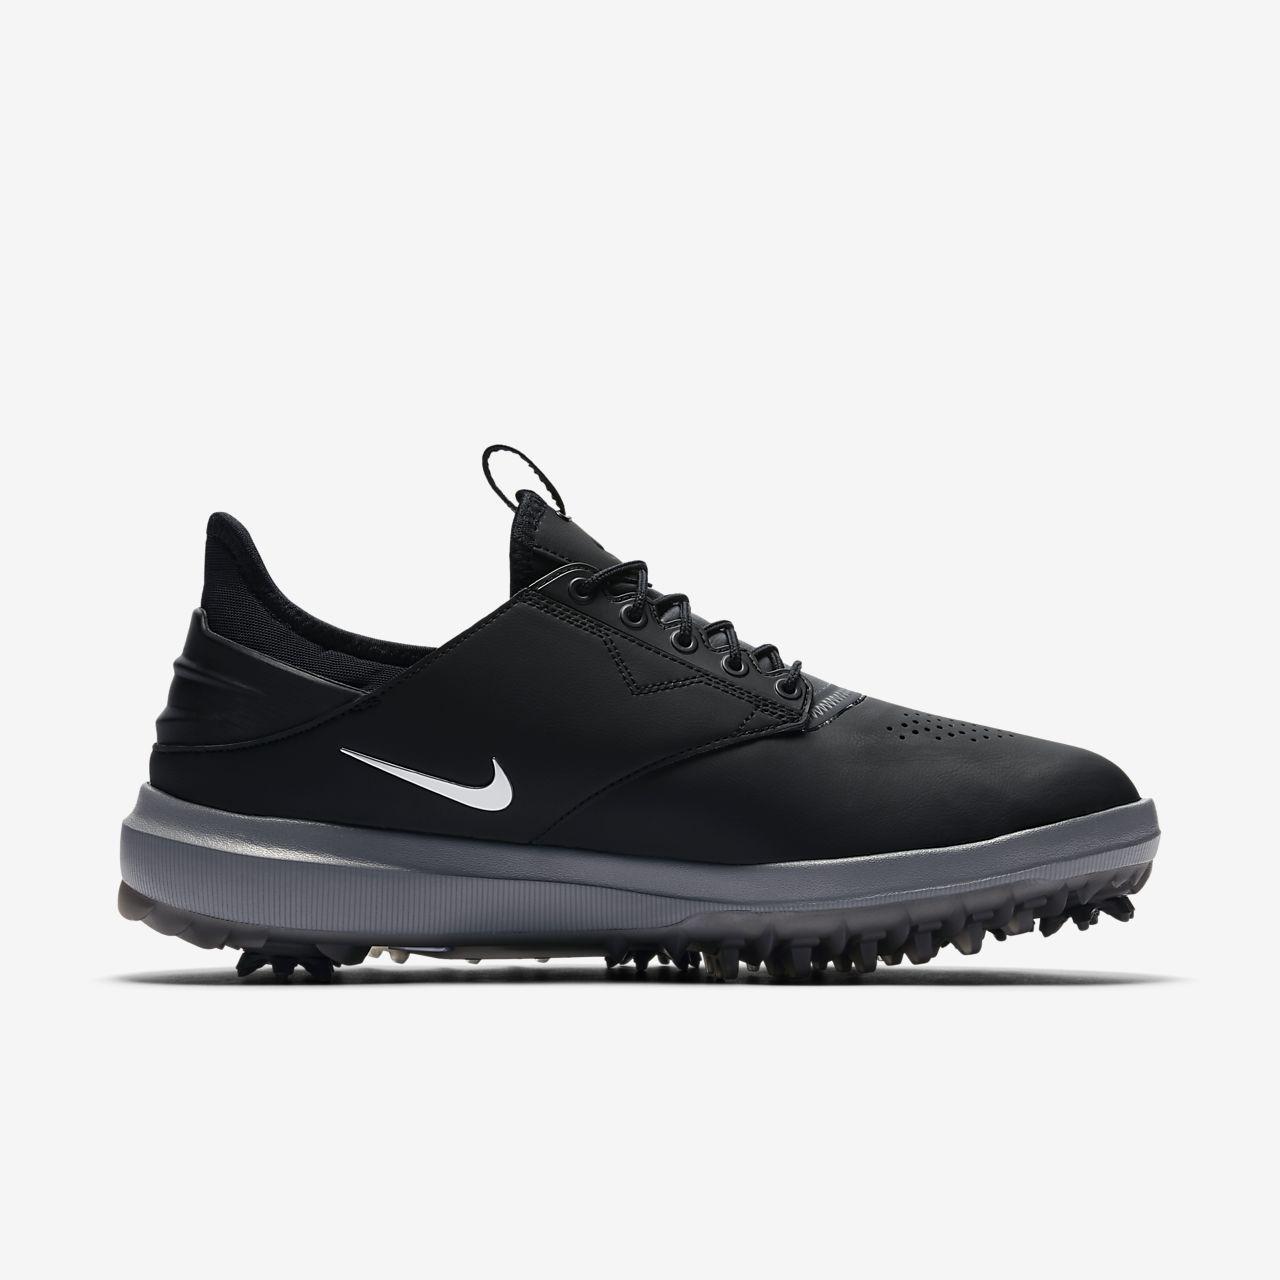 Nike Air Zoom Direct Herren-Golfschuh